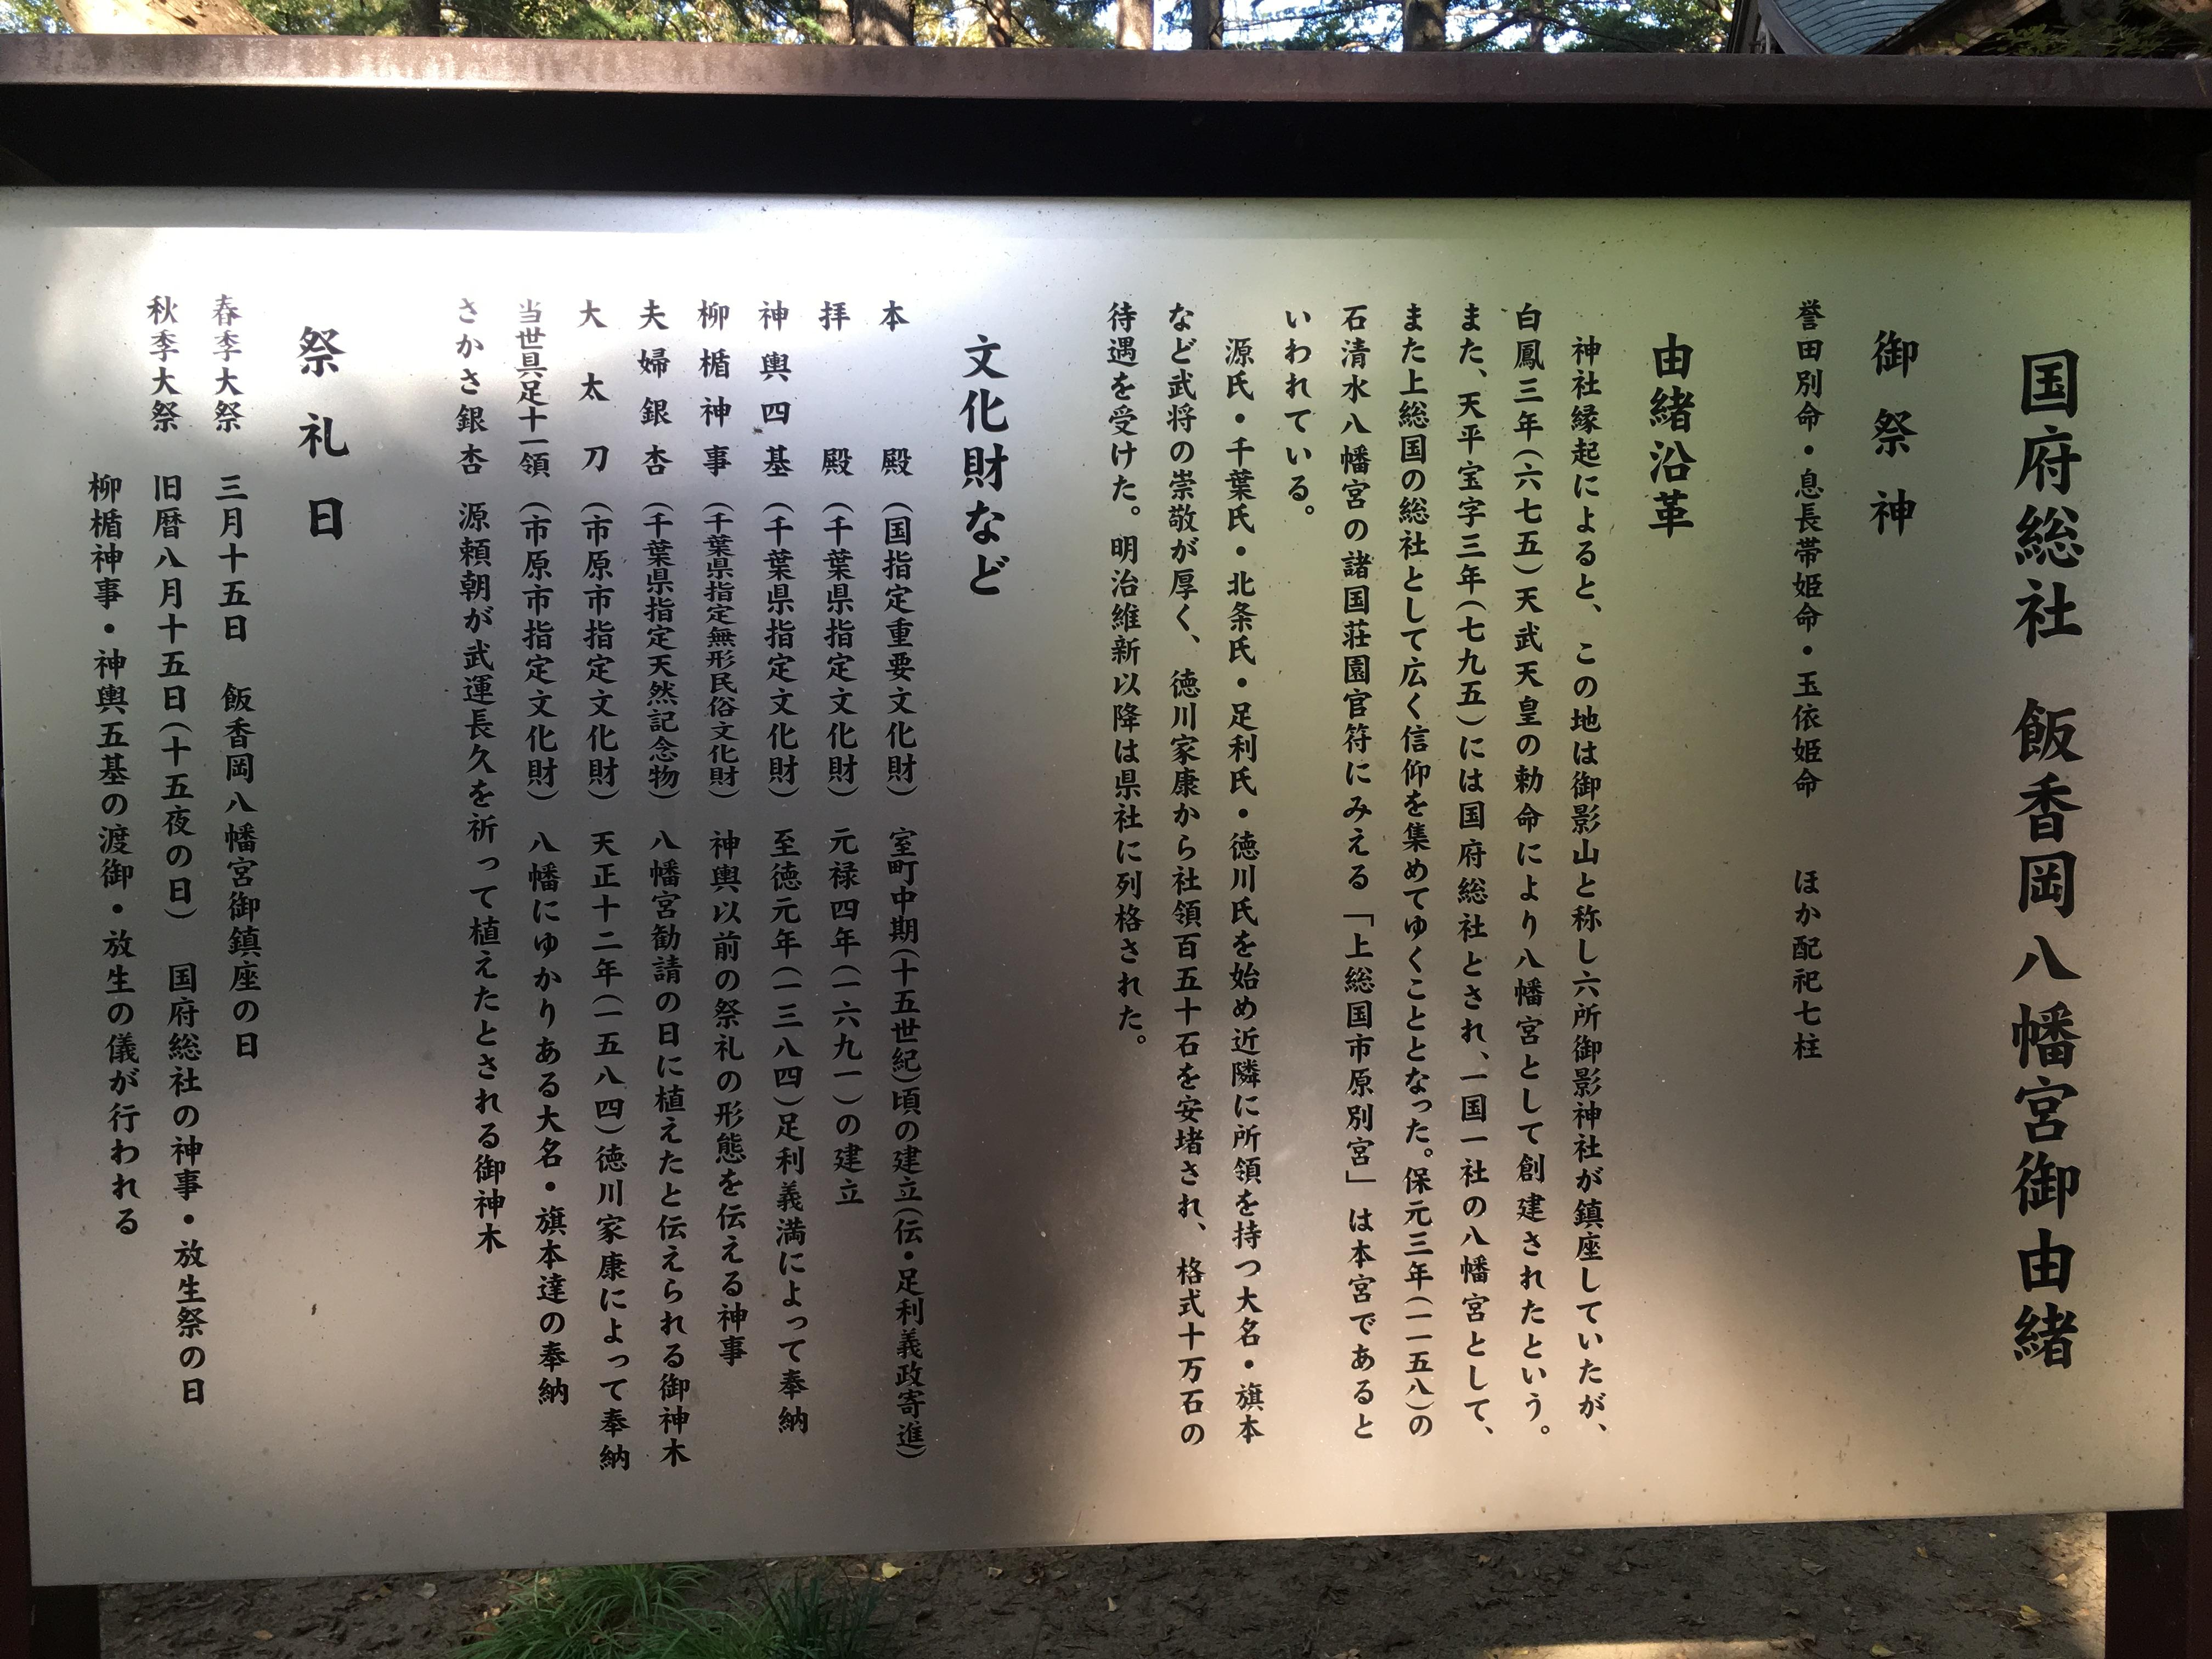 飯香岡八幡宮の歴史